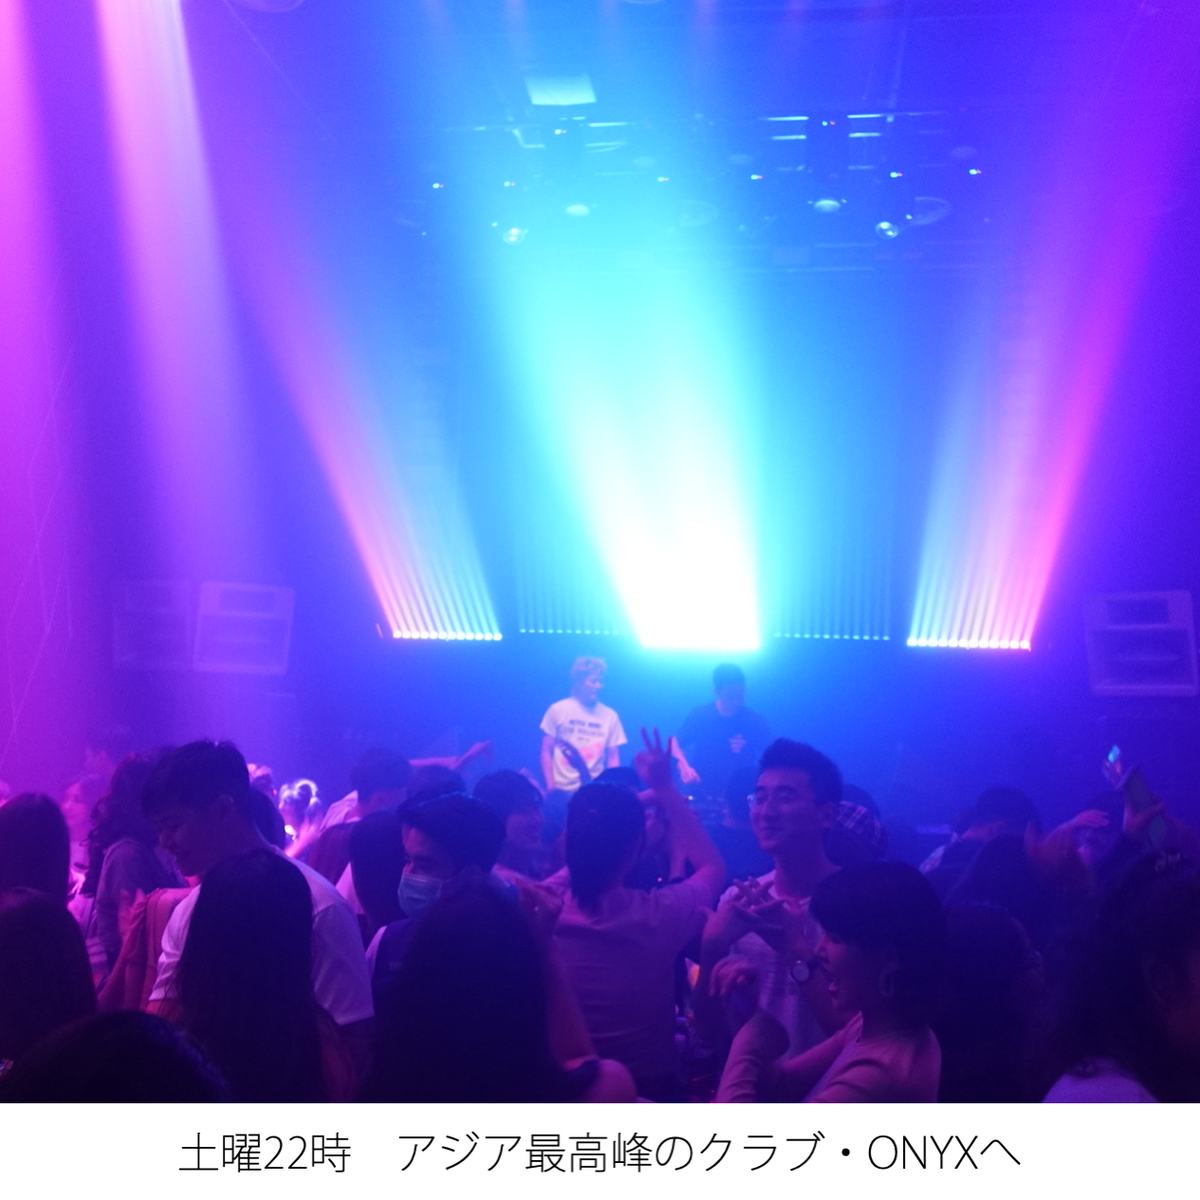 f:id:tomatsu1024:20210815215918p:plain